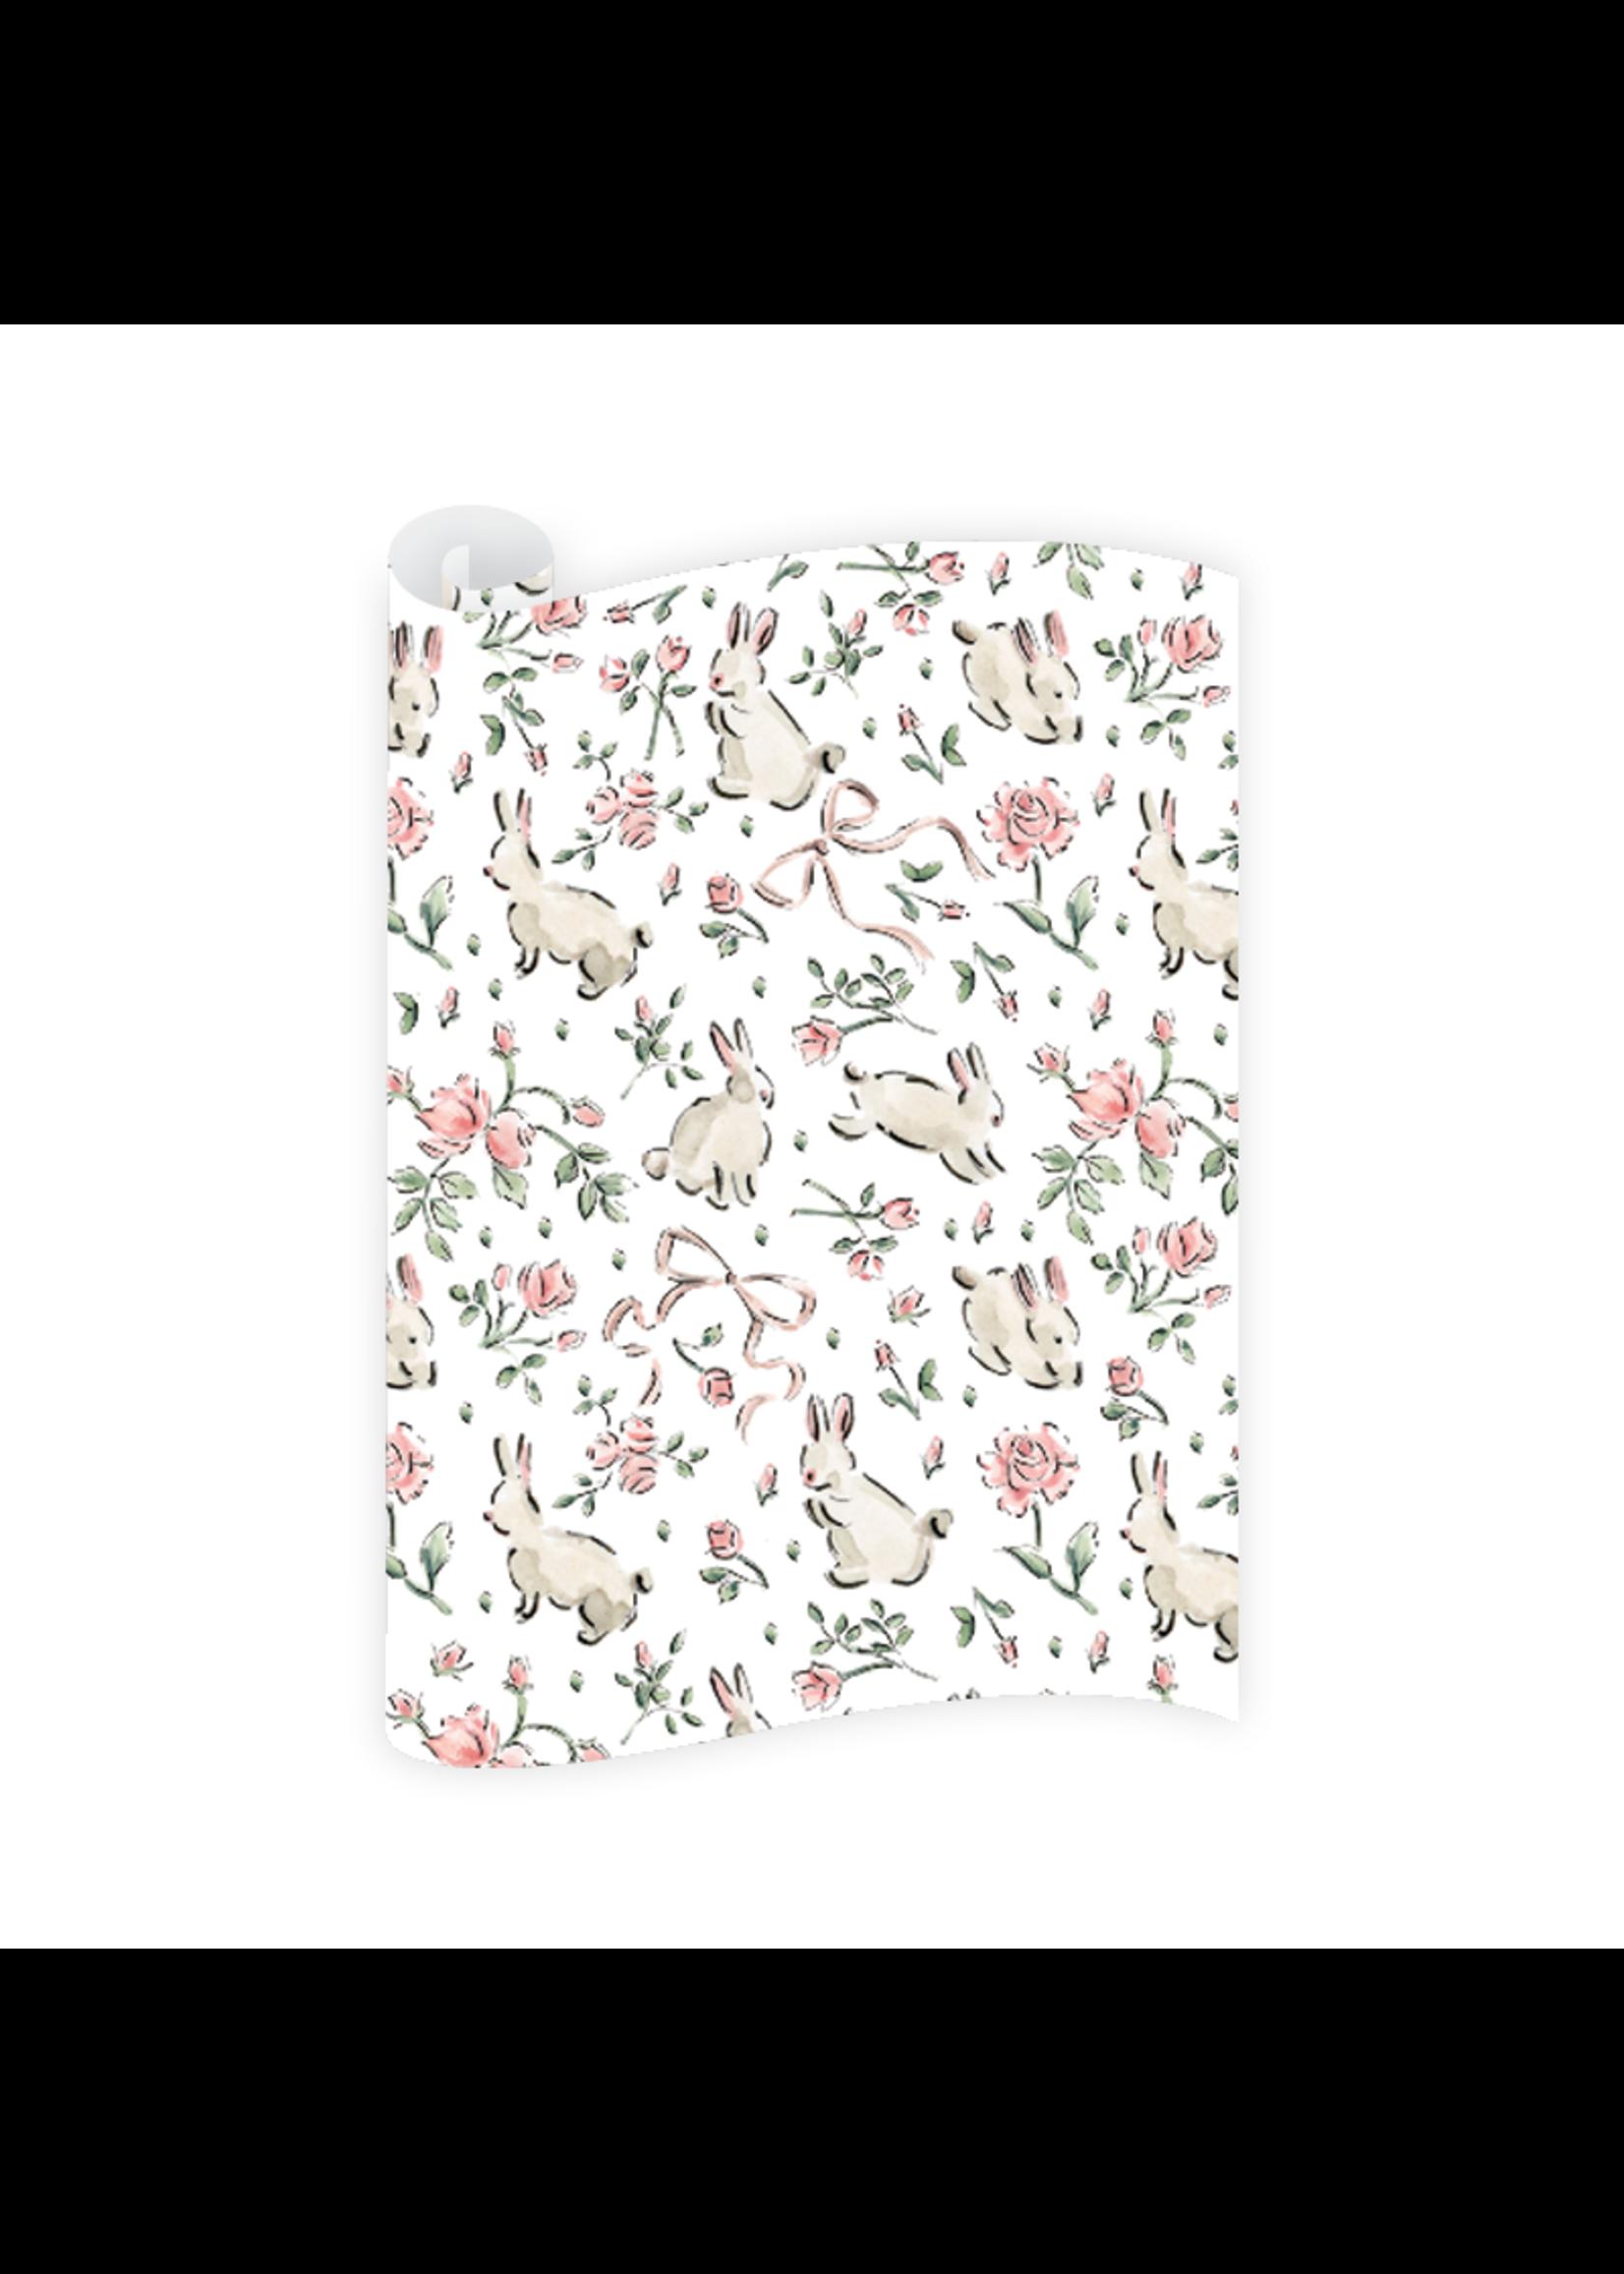 Dogwood Hill Gift Wrap Sheets - Bunnies (3 sheets 20x30)